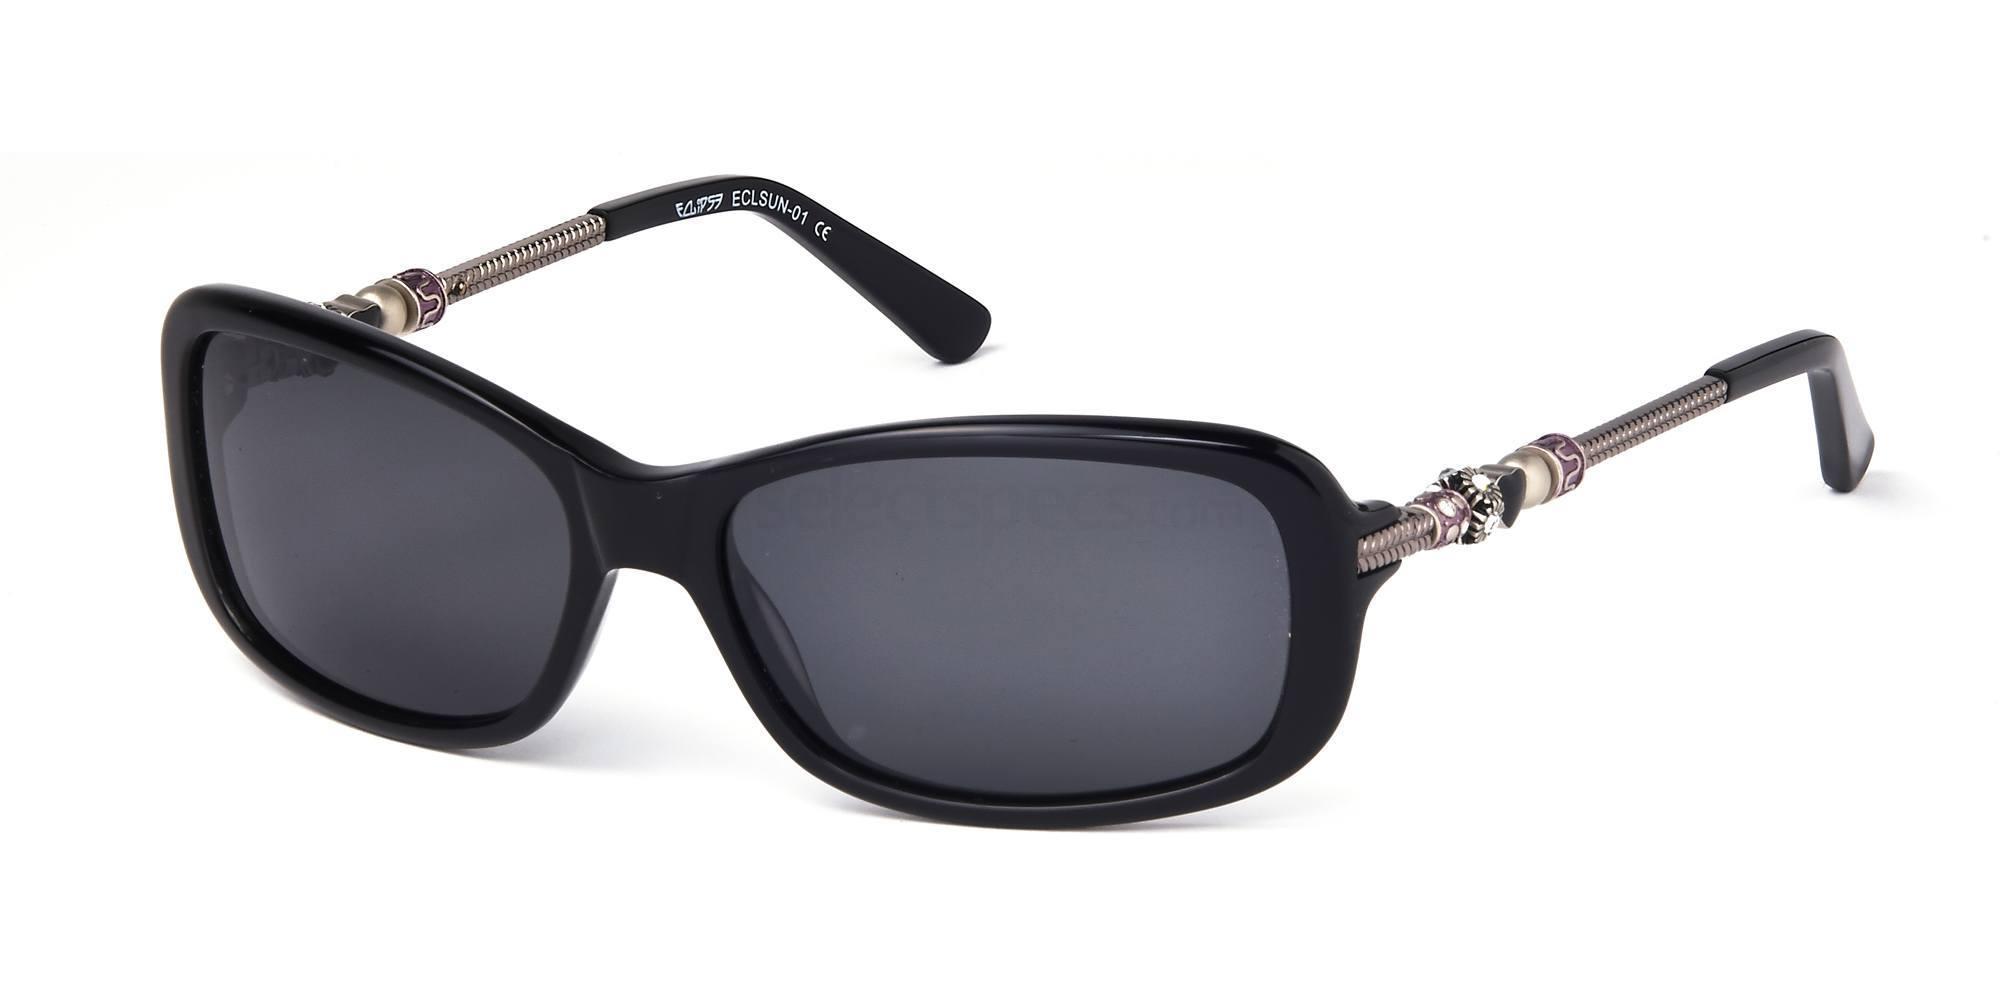 C1 ECLSUN01 Sunglasses, Eclipse